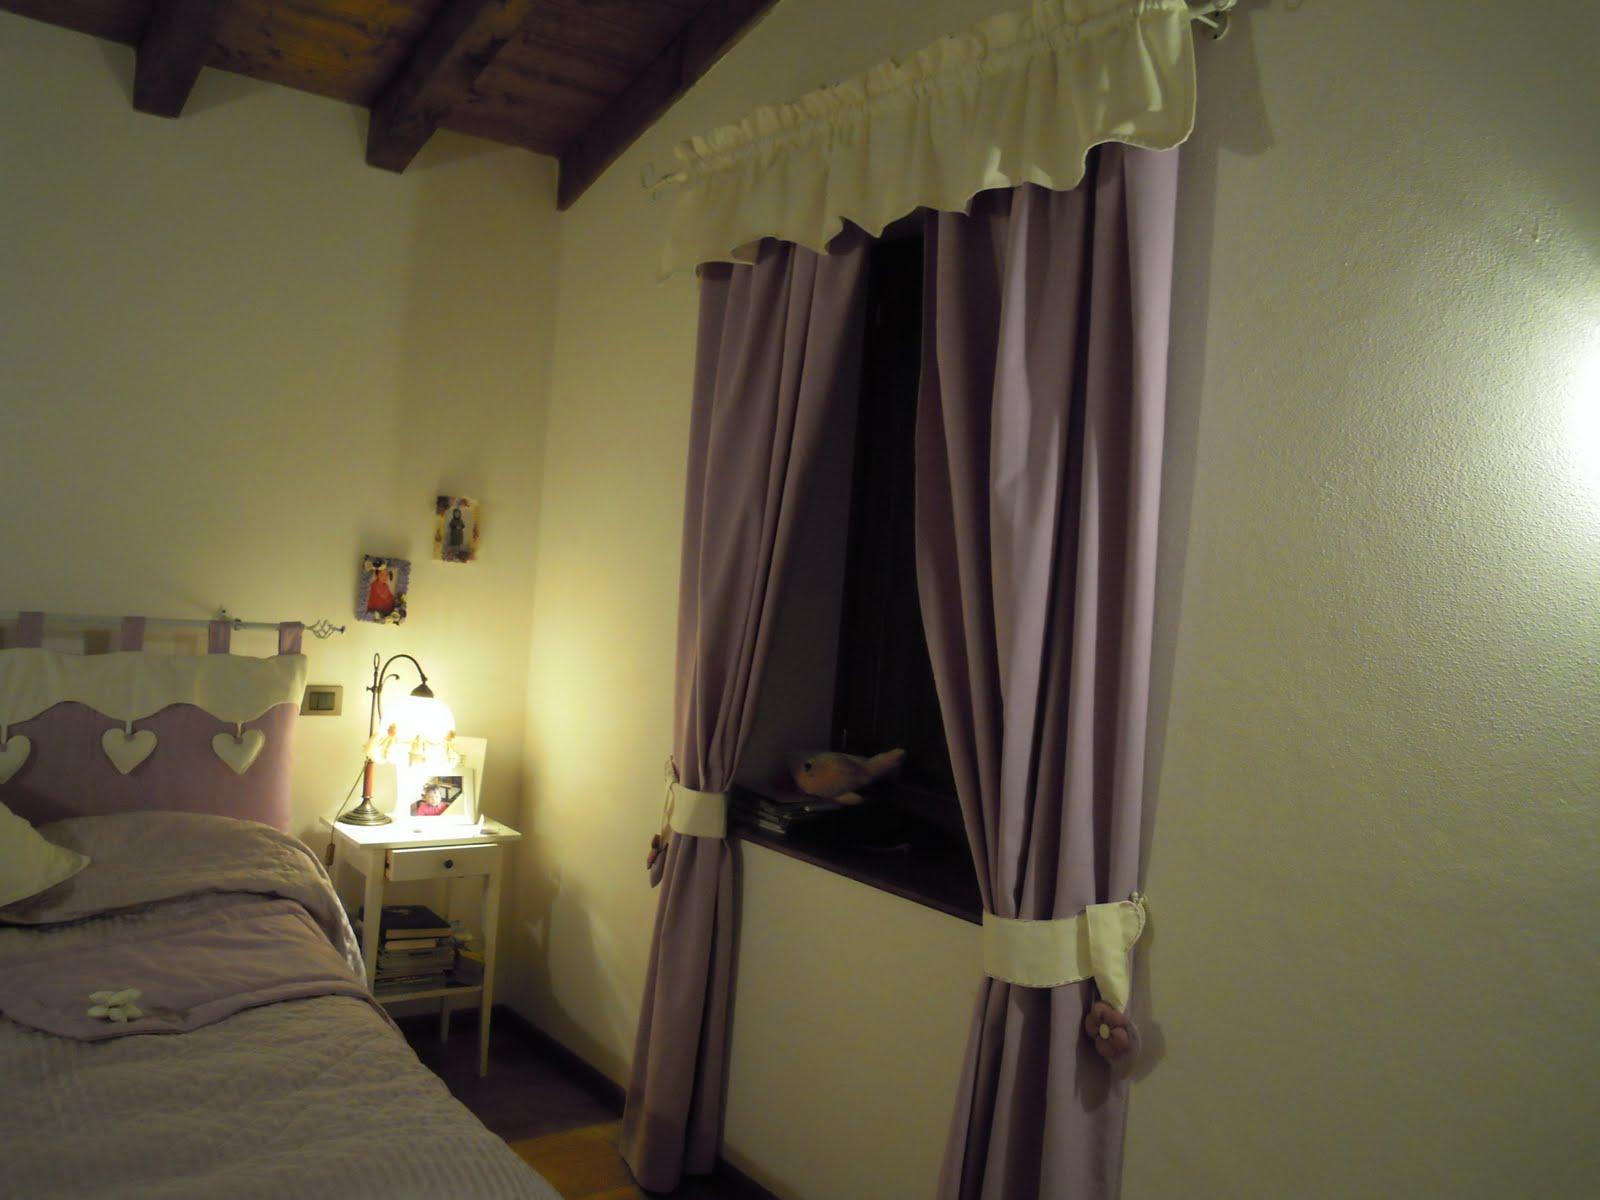 lampadari stile provenzale : Lampadari camerette - Tutte le offerte : Cascare a Fagiolo